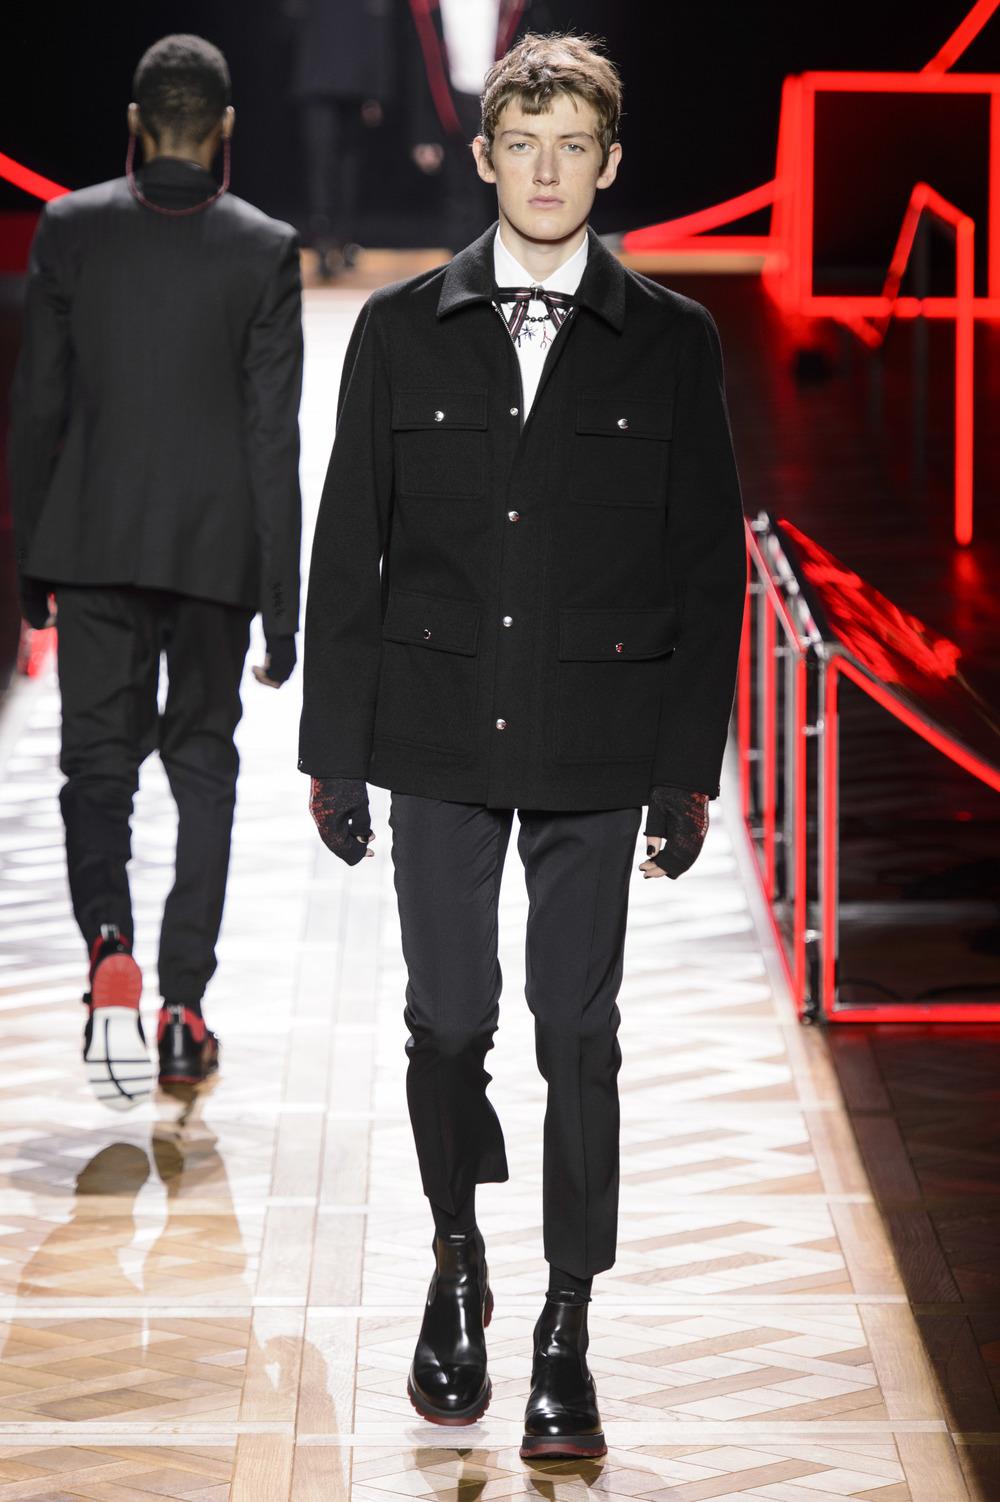 Dior_Homme_Hiver2016-17_look_08.JPG